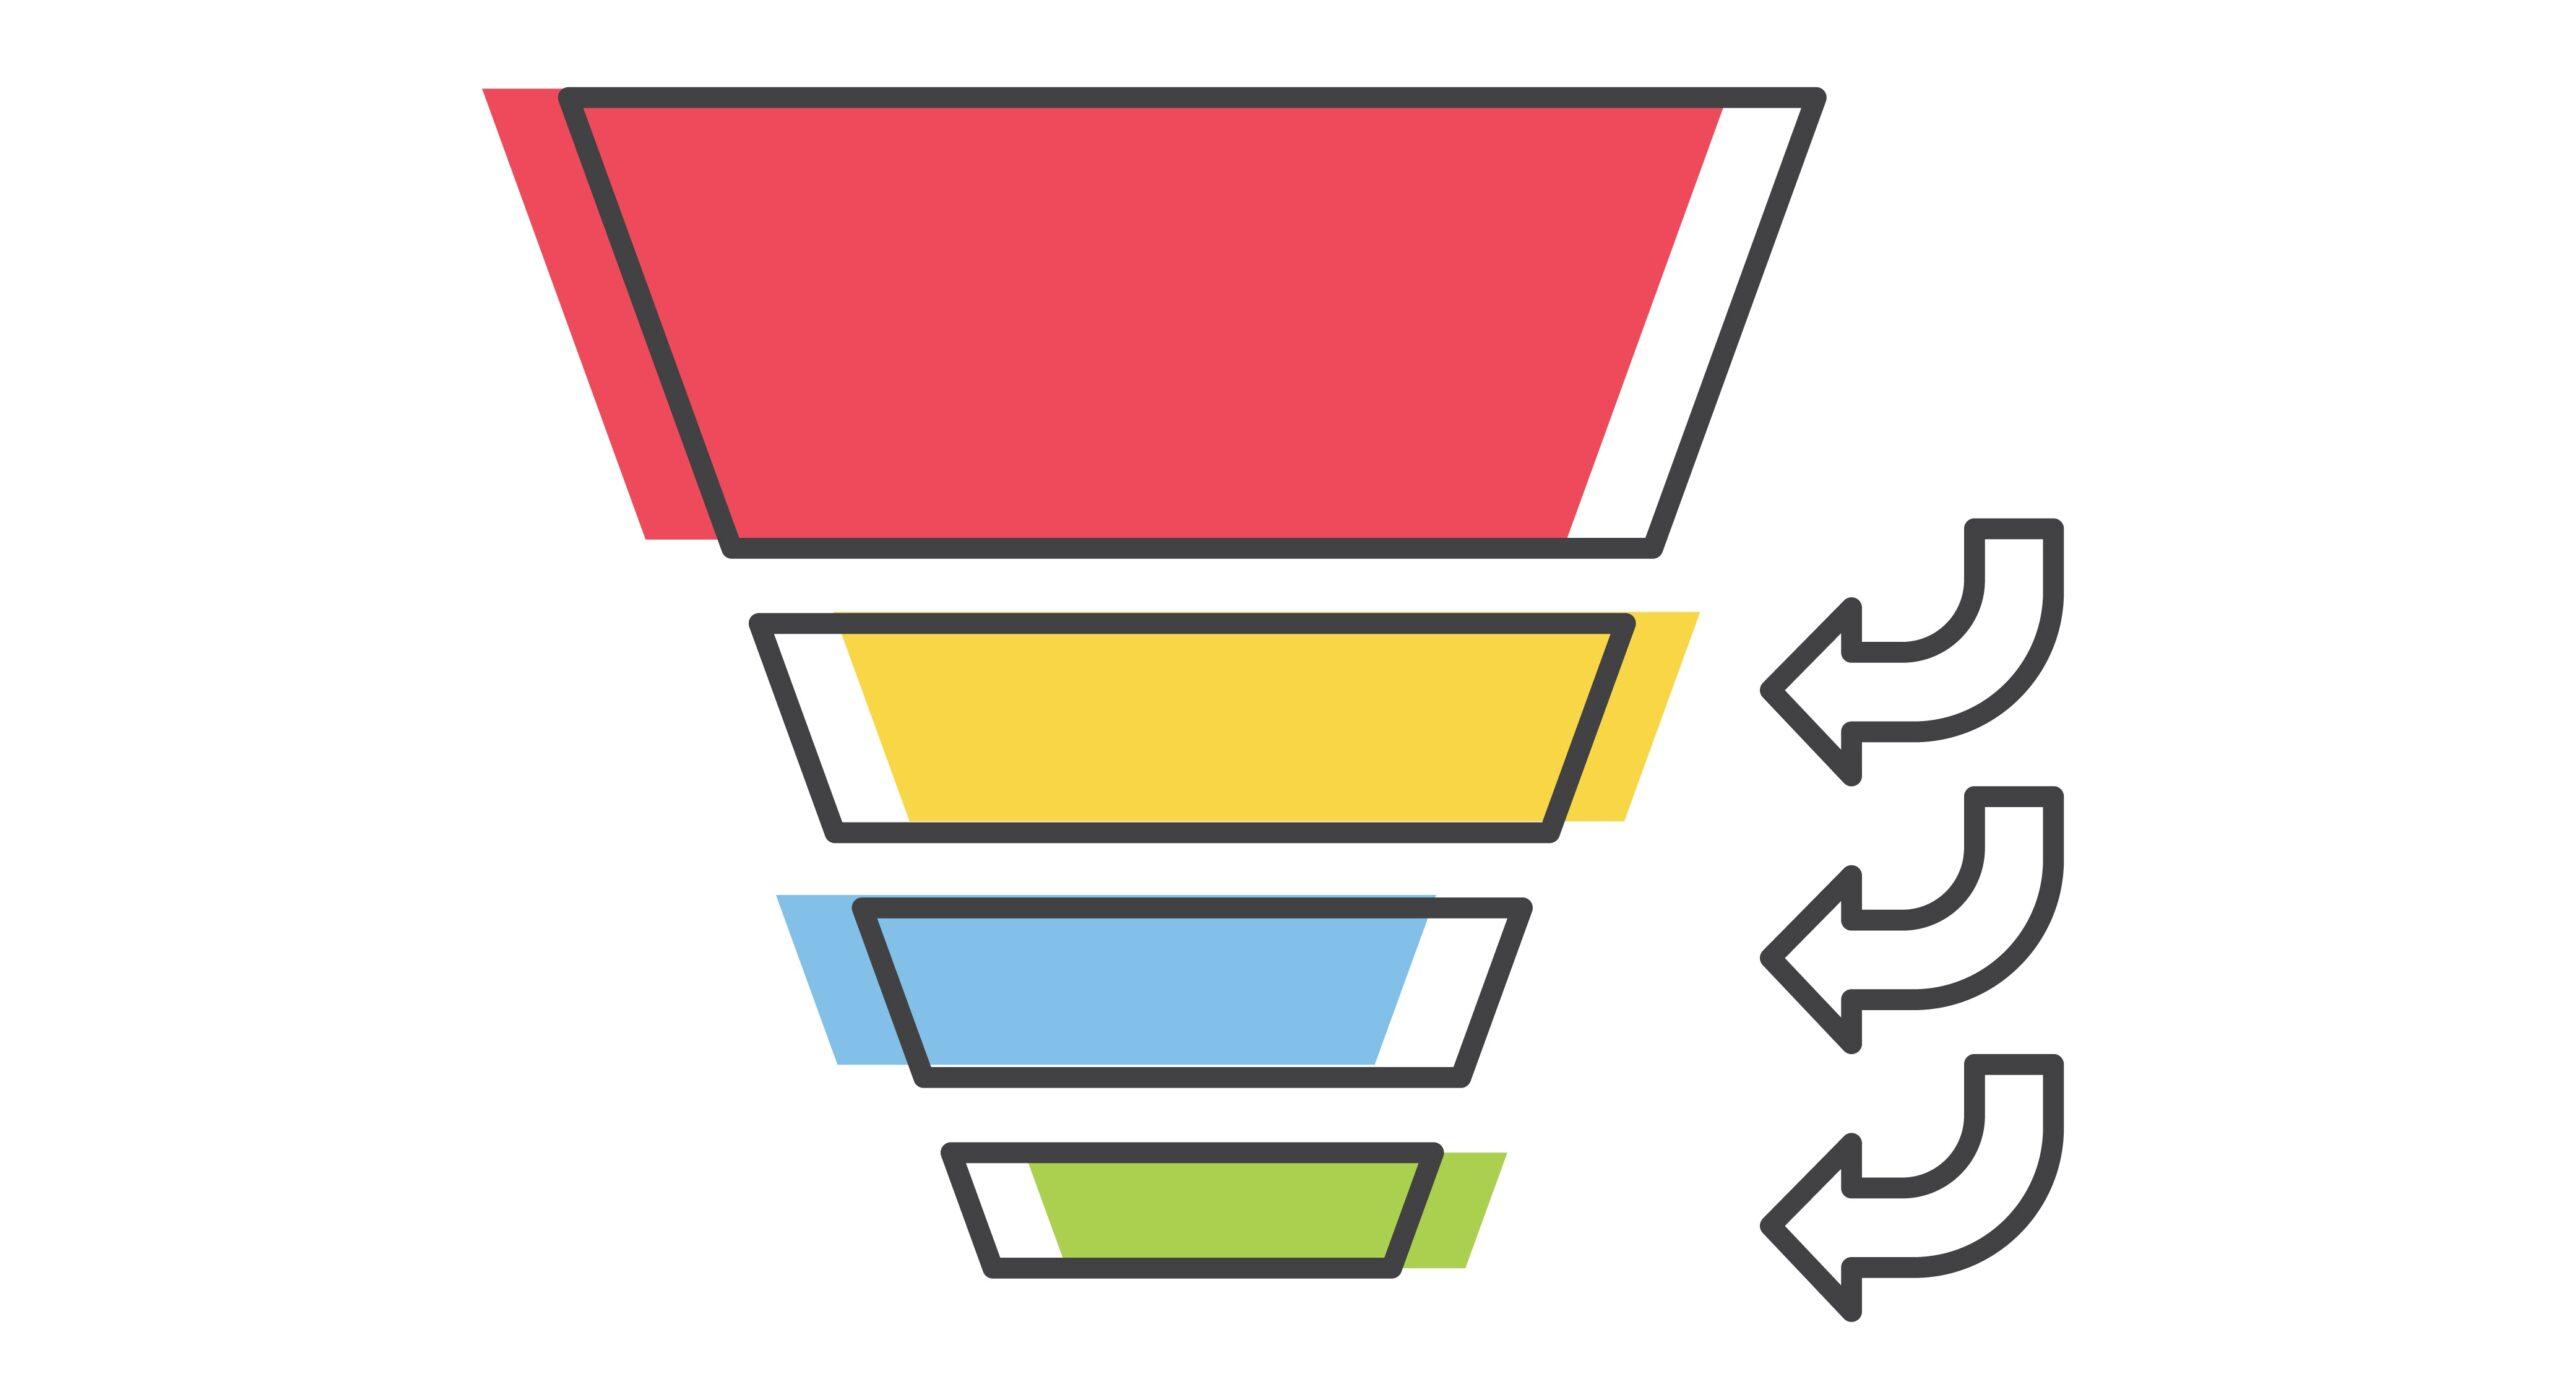 Digital Marketing Strategy Guide: Create a Marketing Funnel